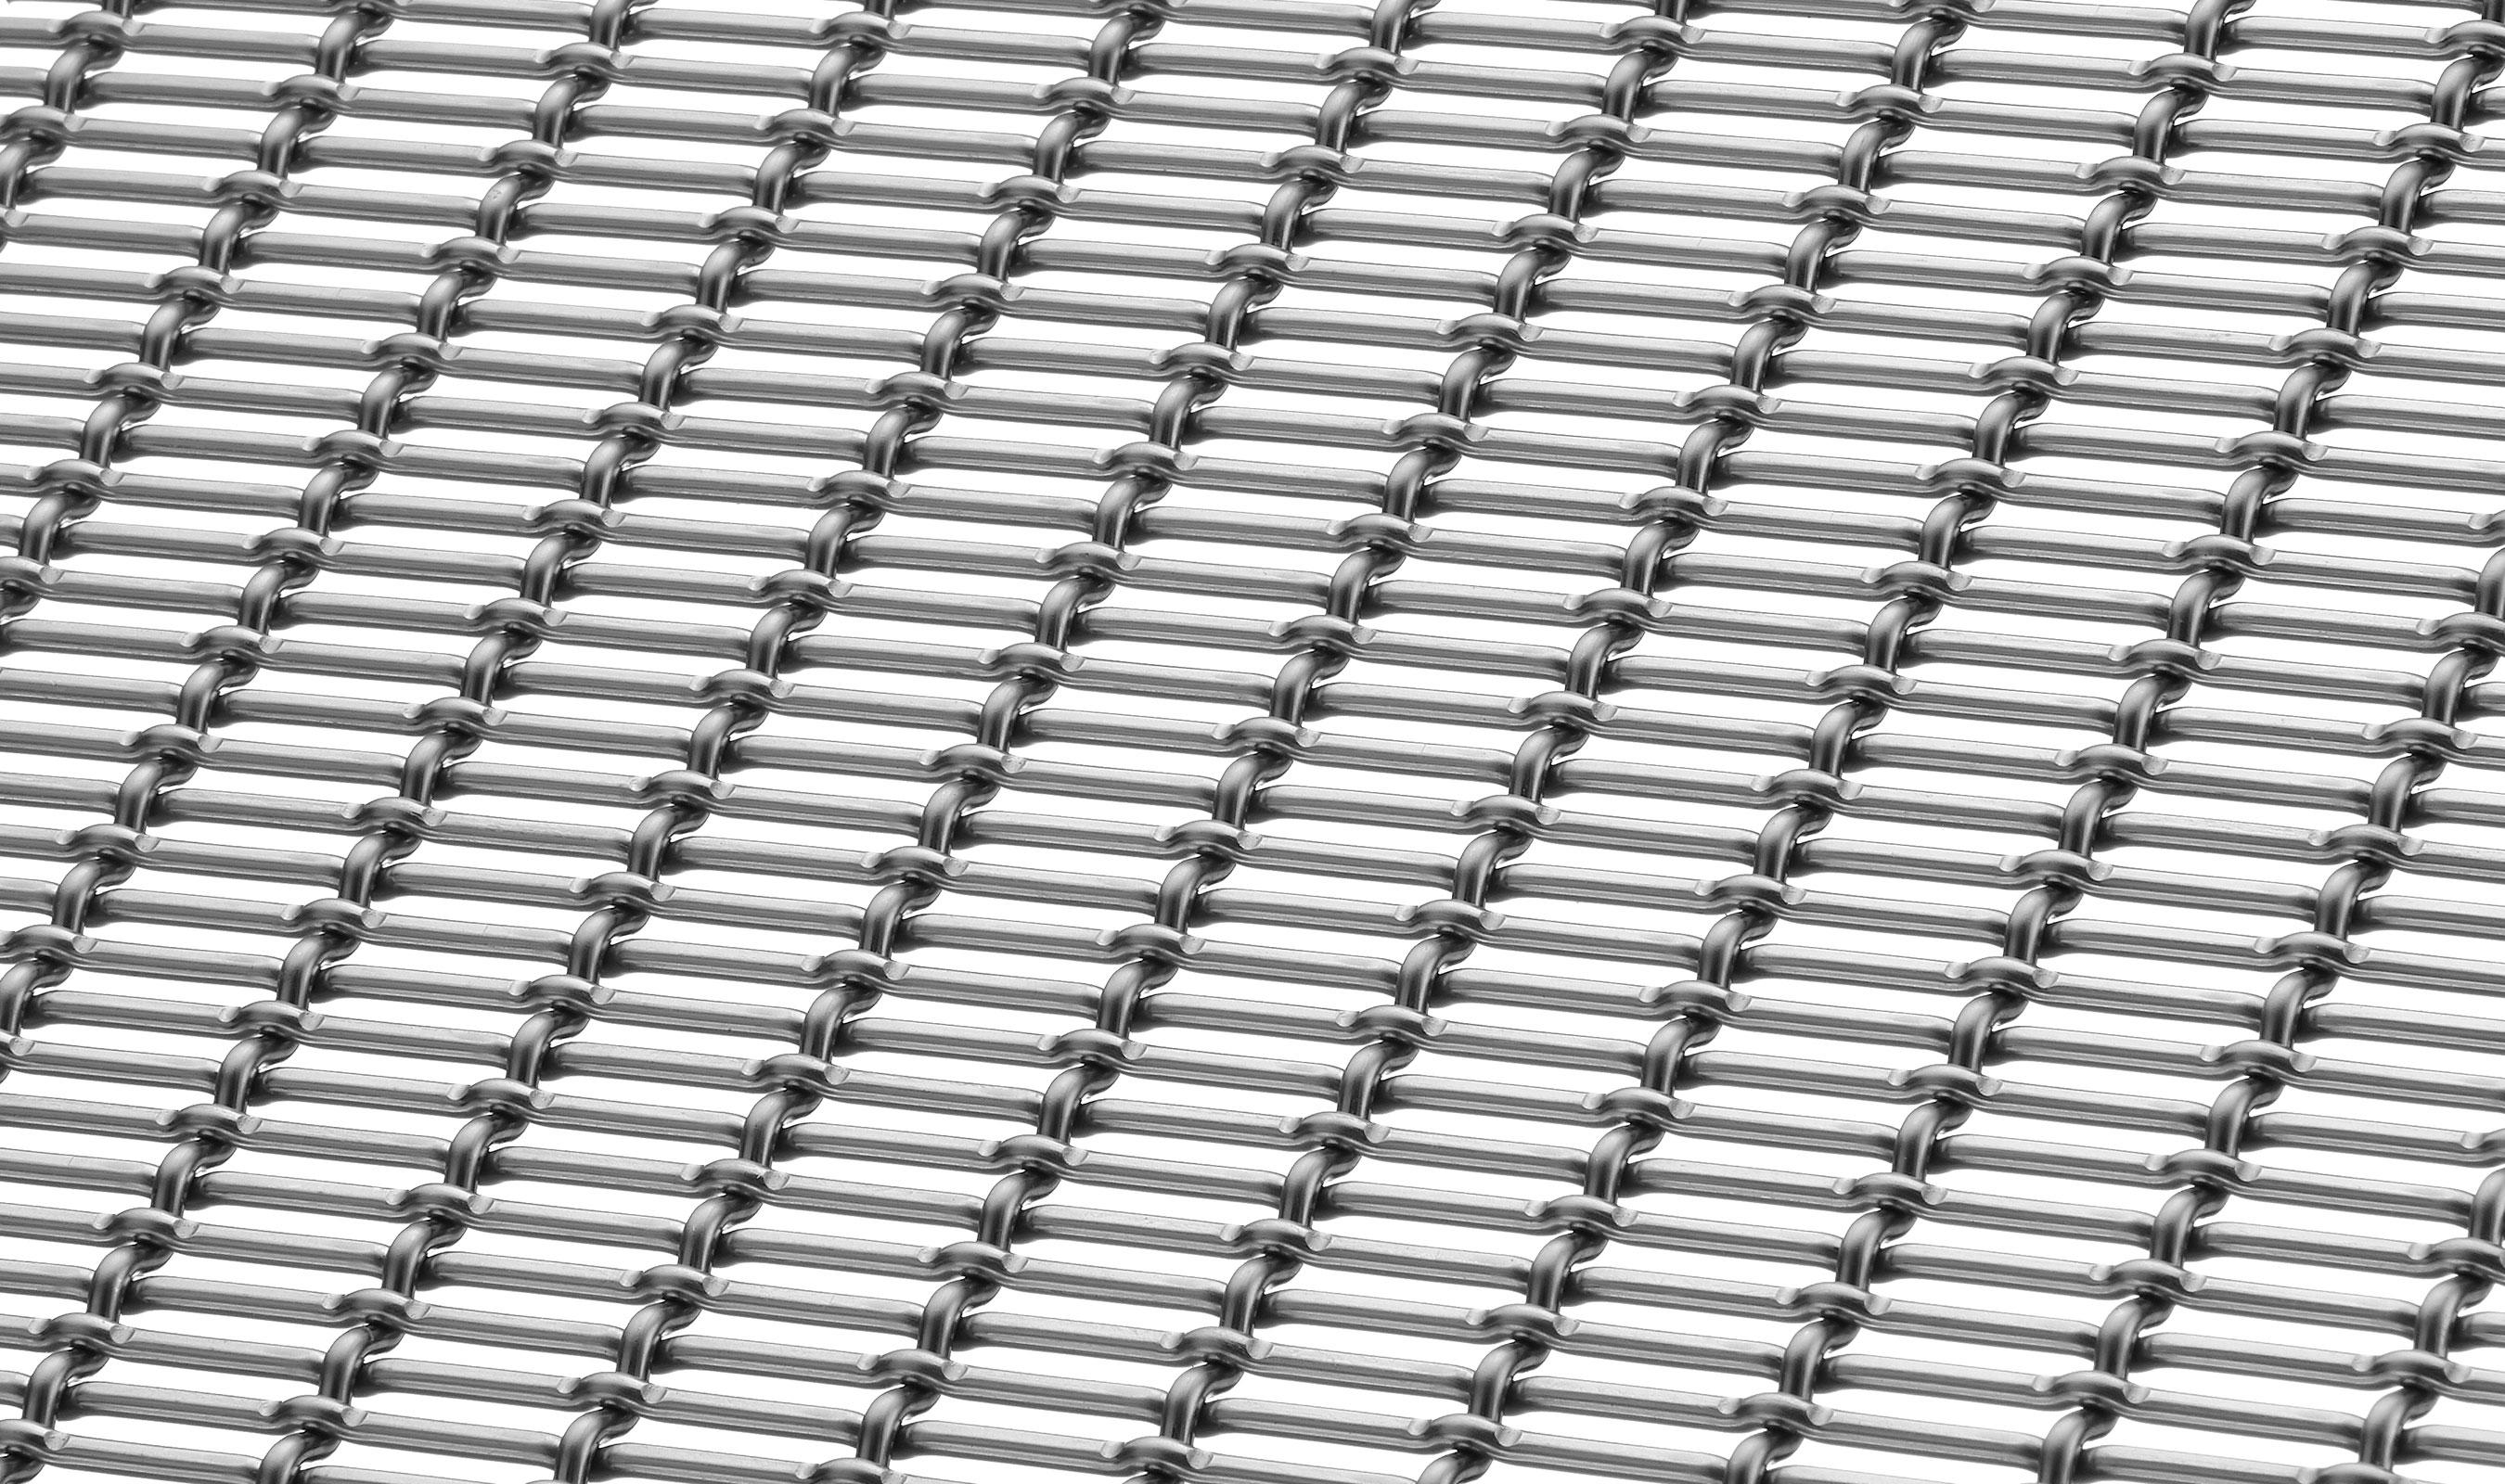 LPZ-62 stainless steel architectural wire mesh